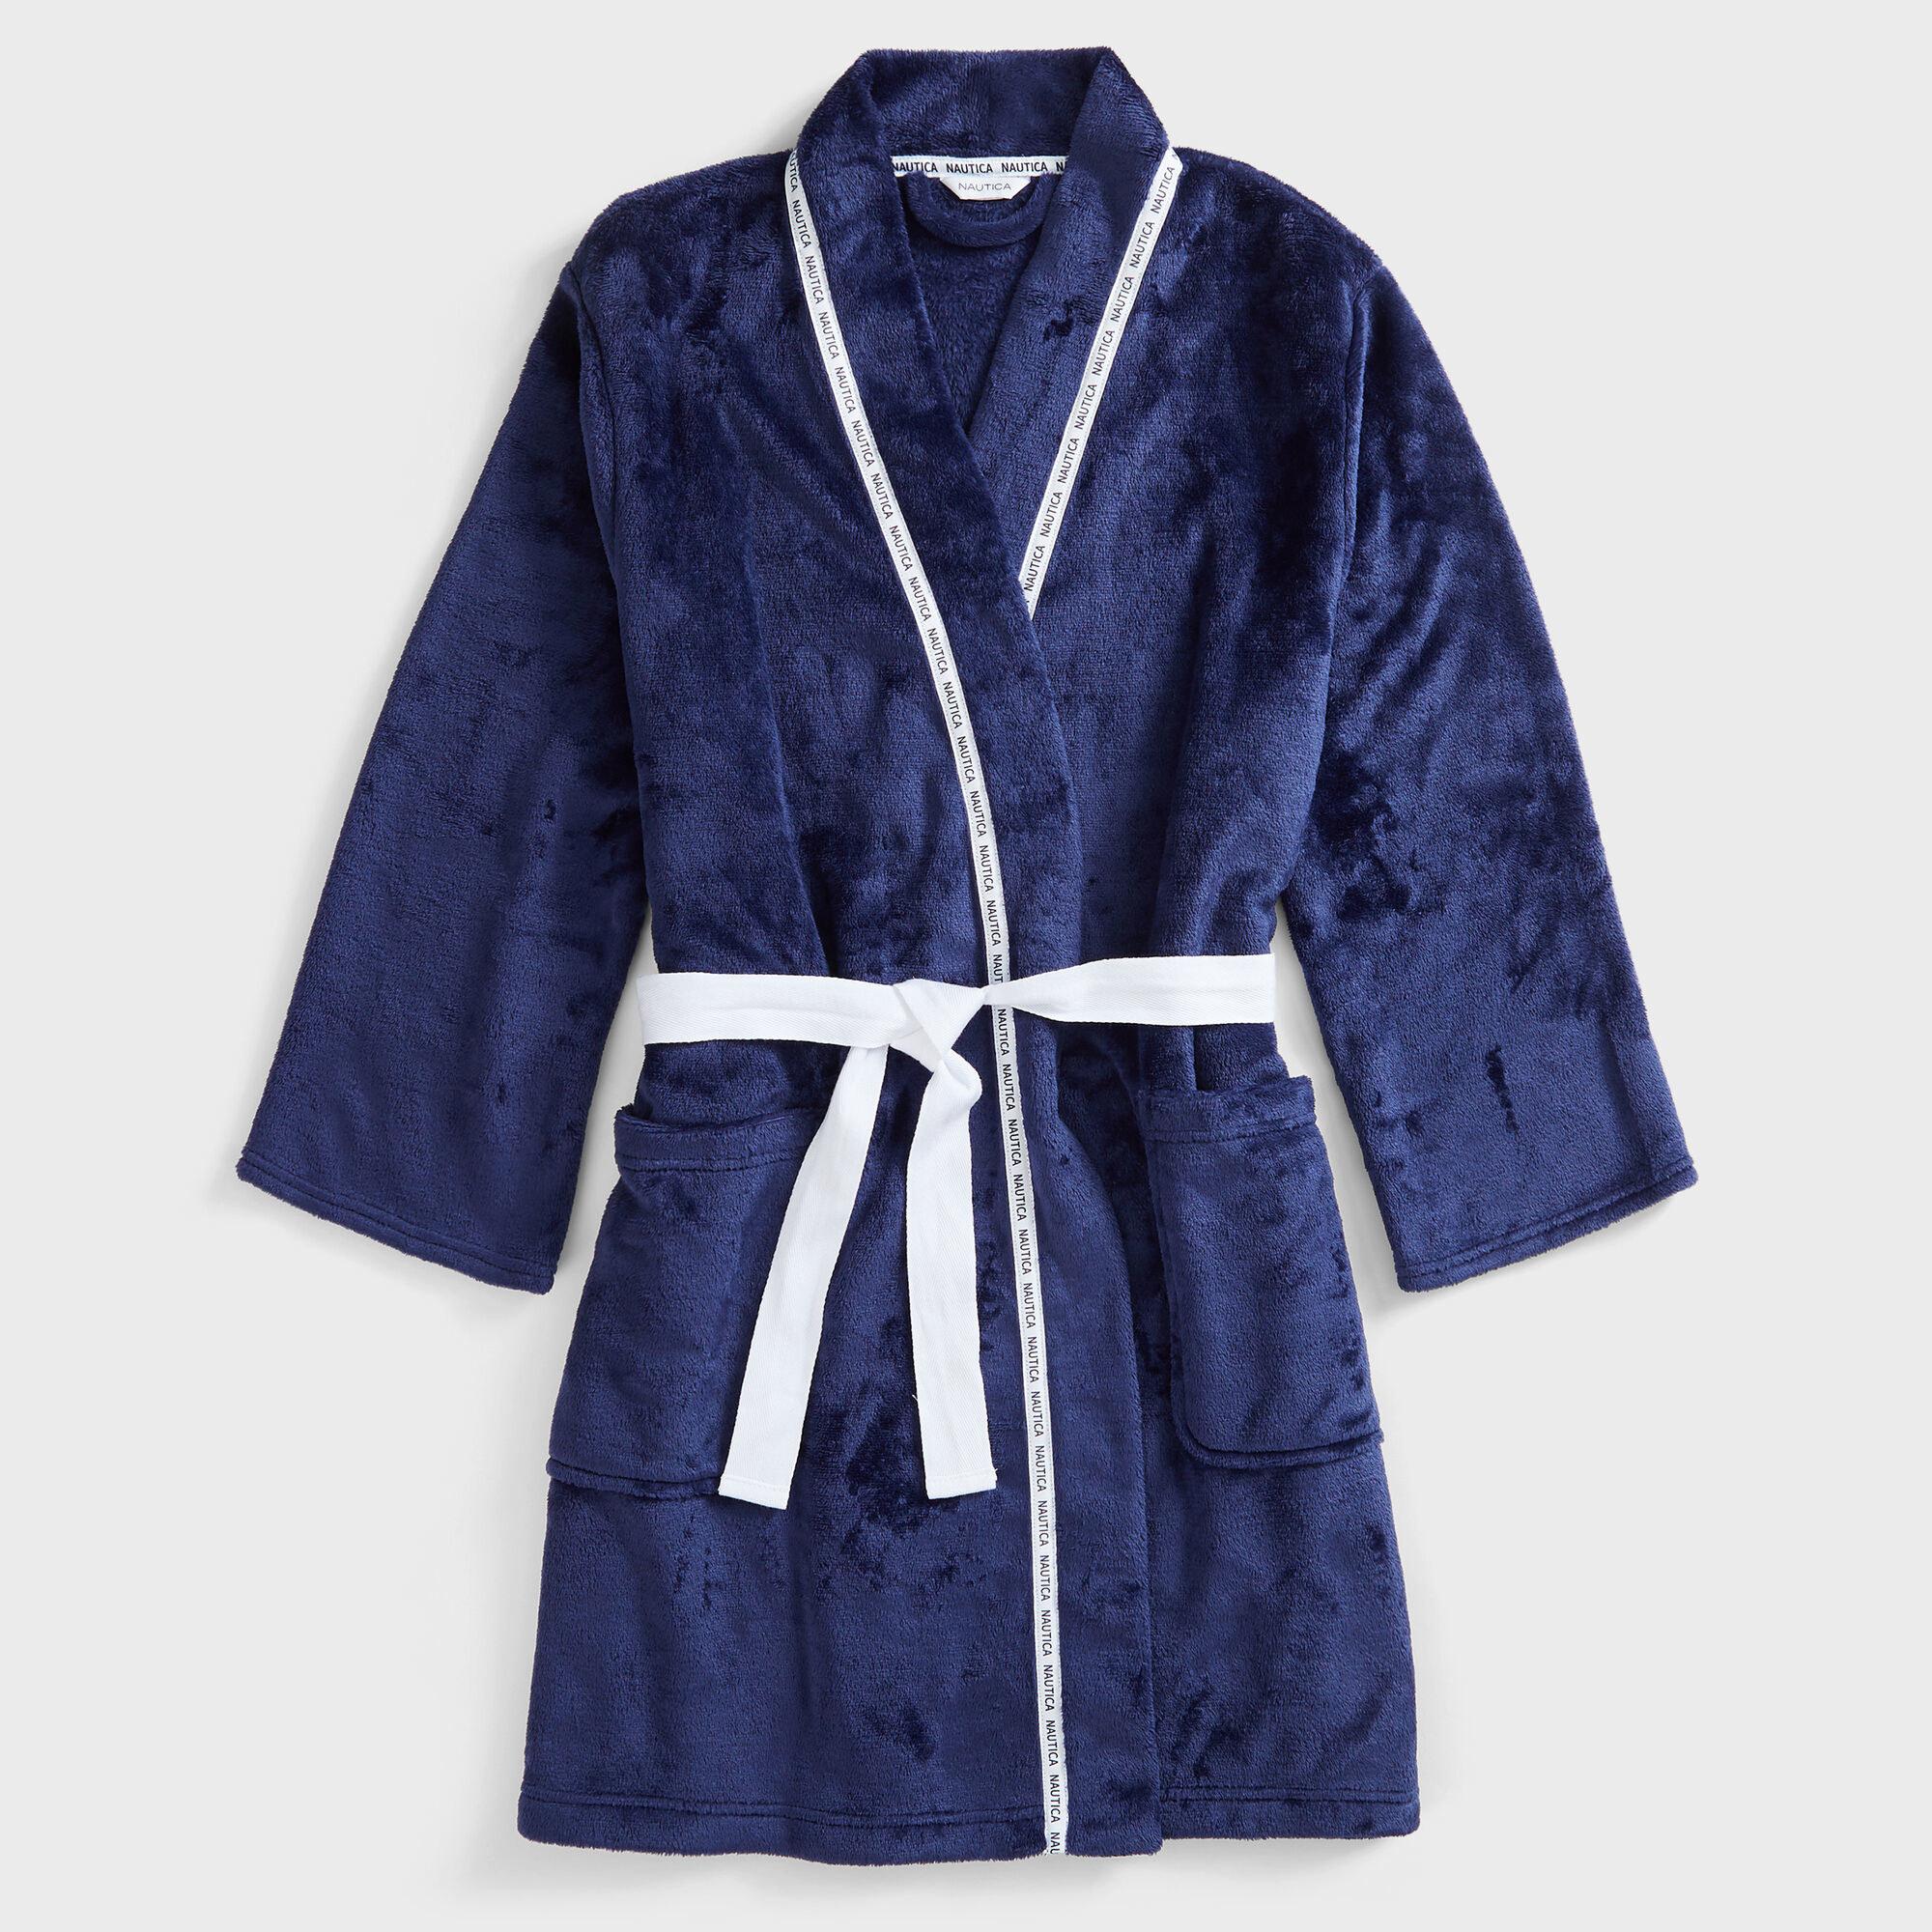 the blue robe